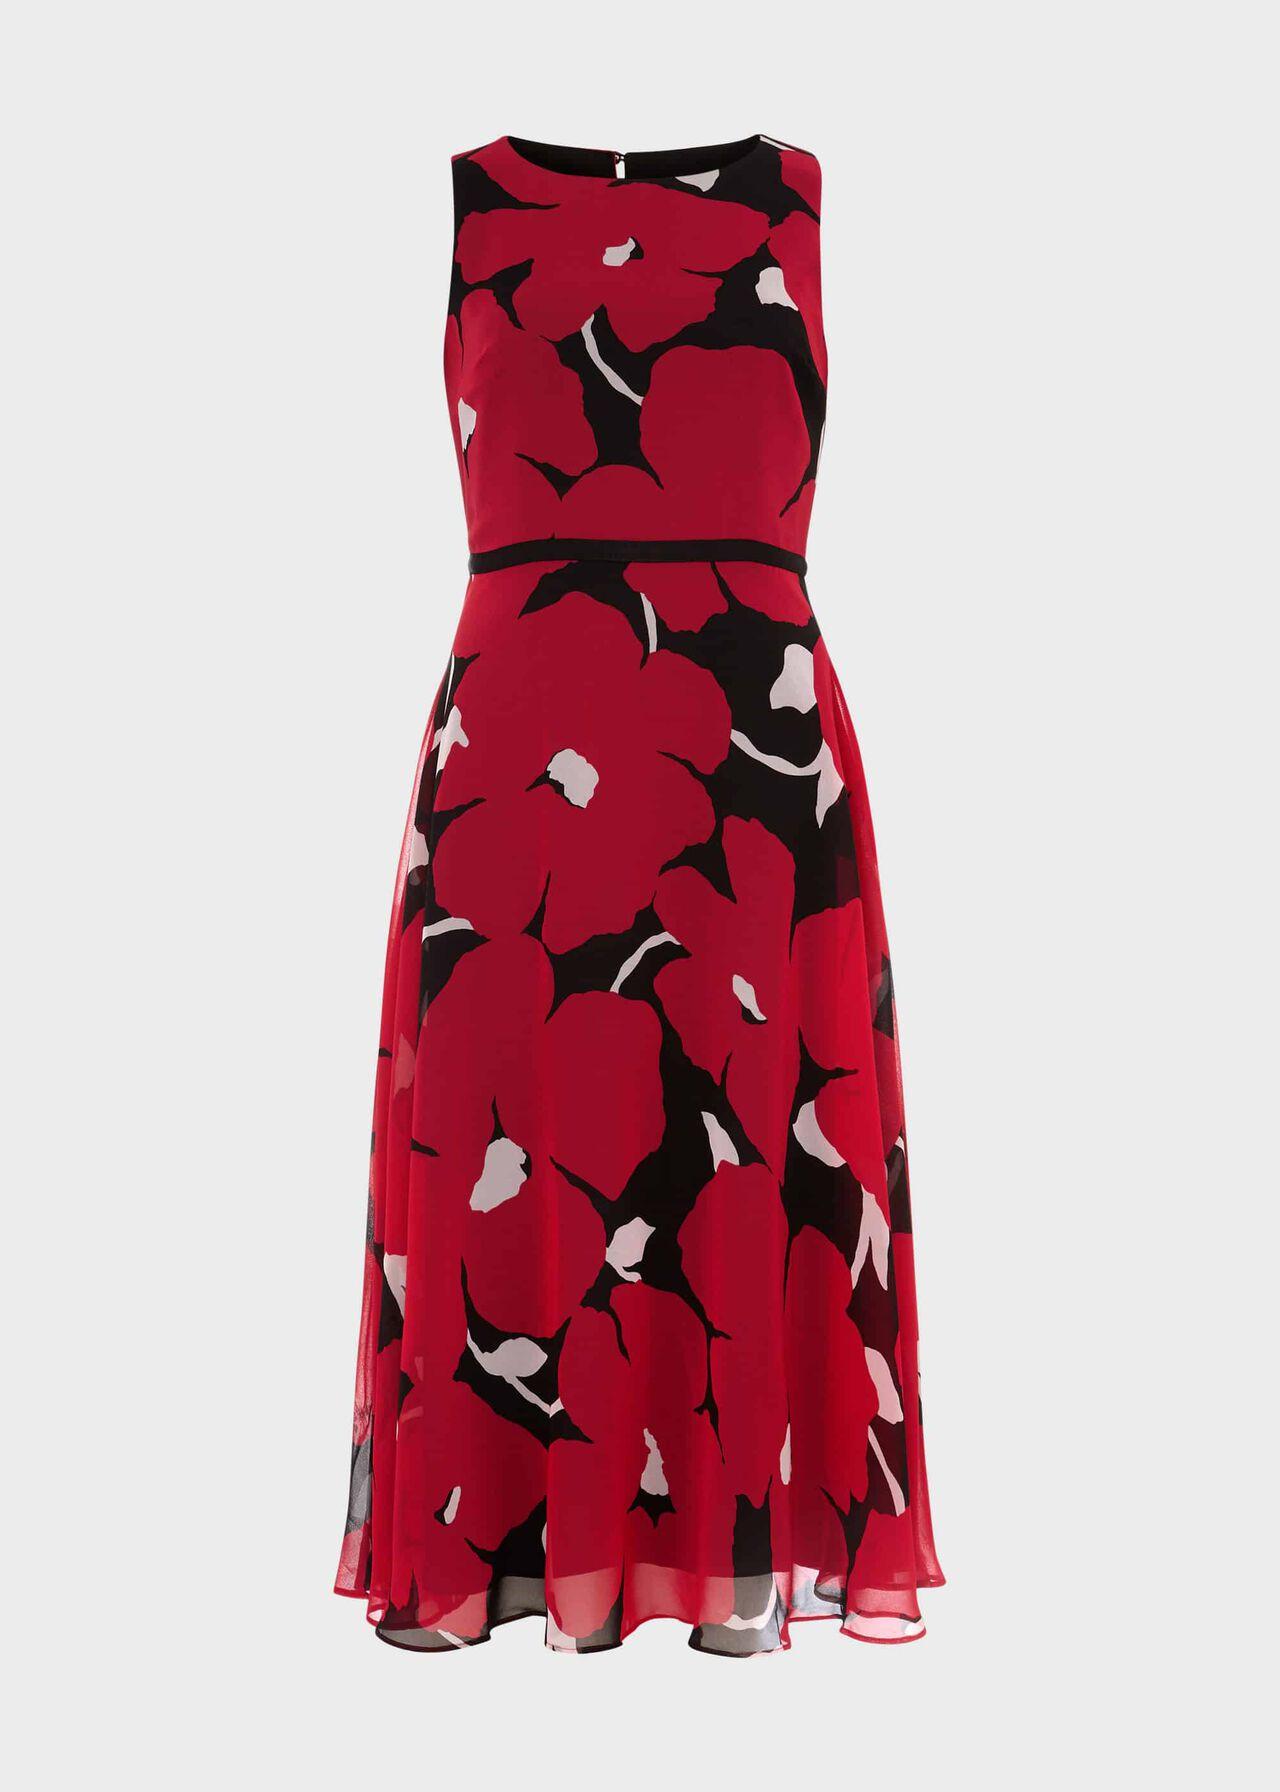 Petite Carly Floral Midi Dress Black Pink